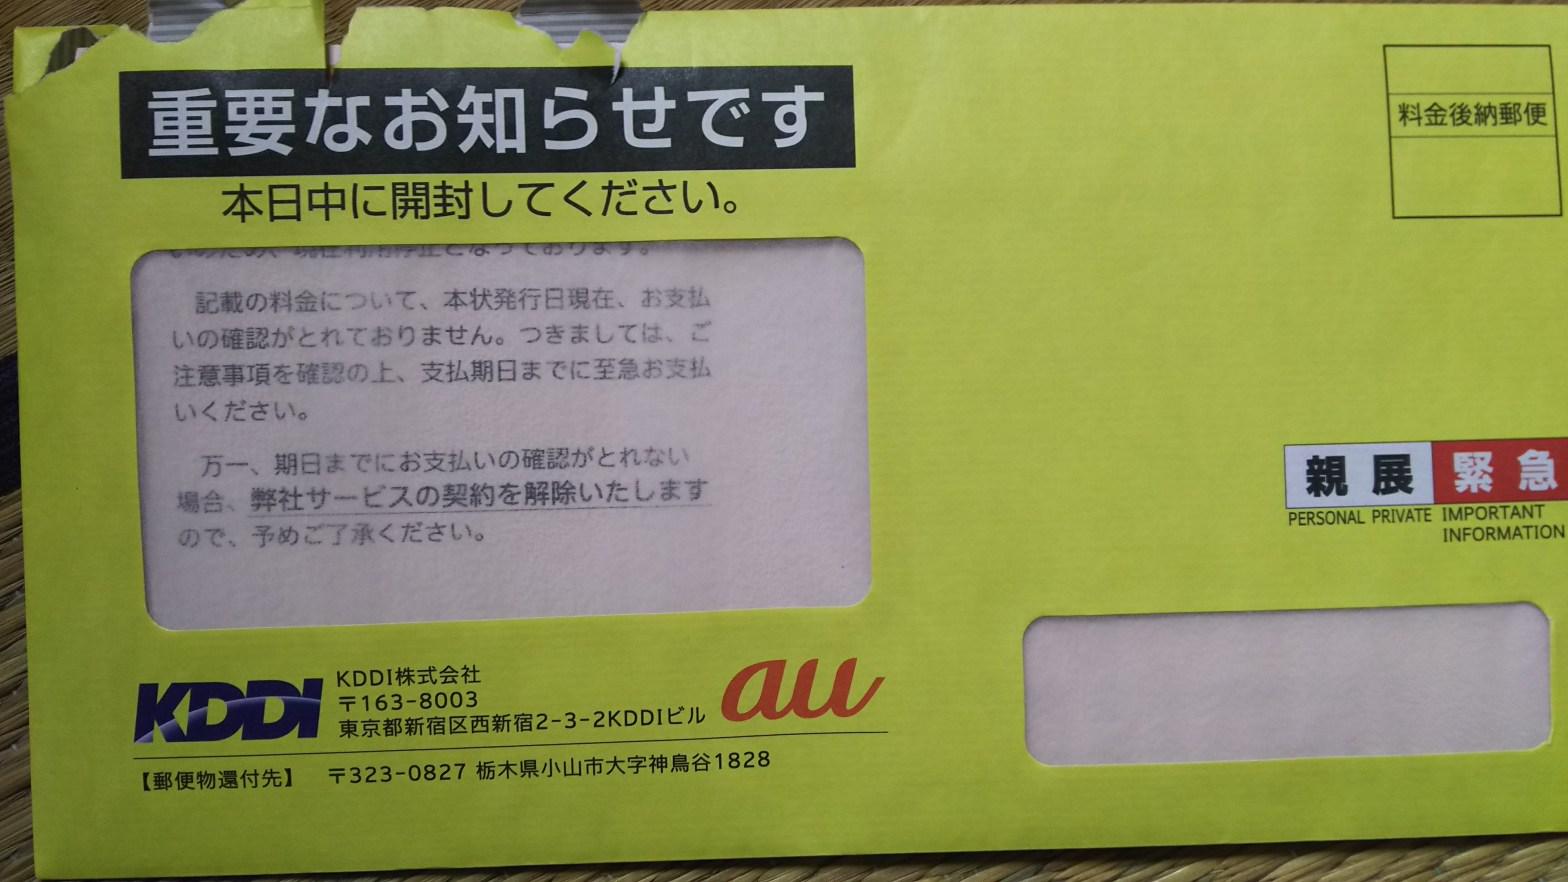 AUの契約解除予告通知書